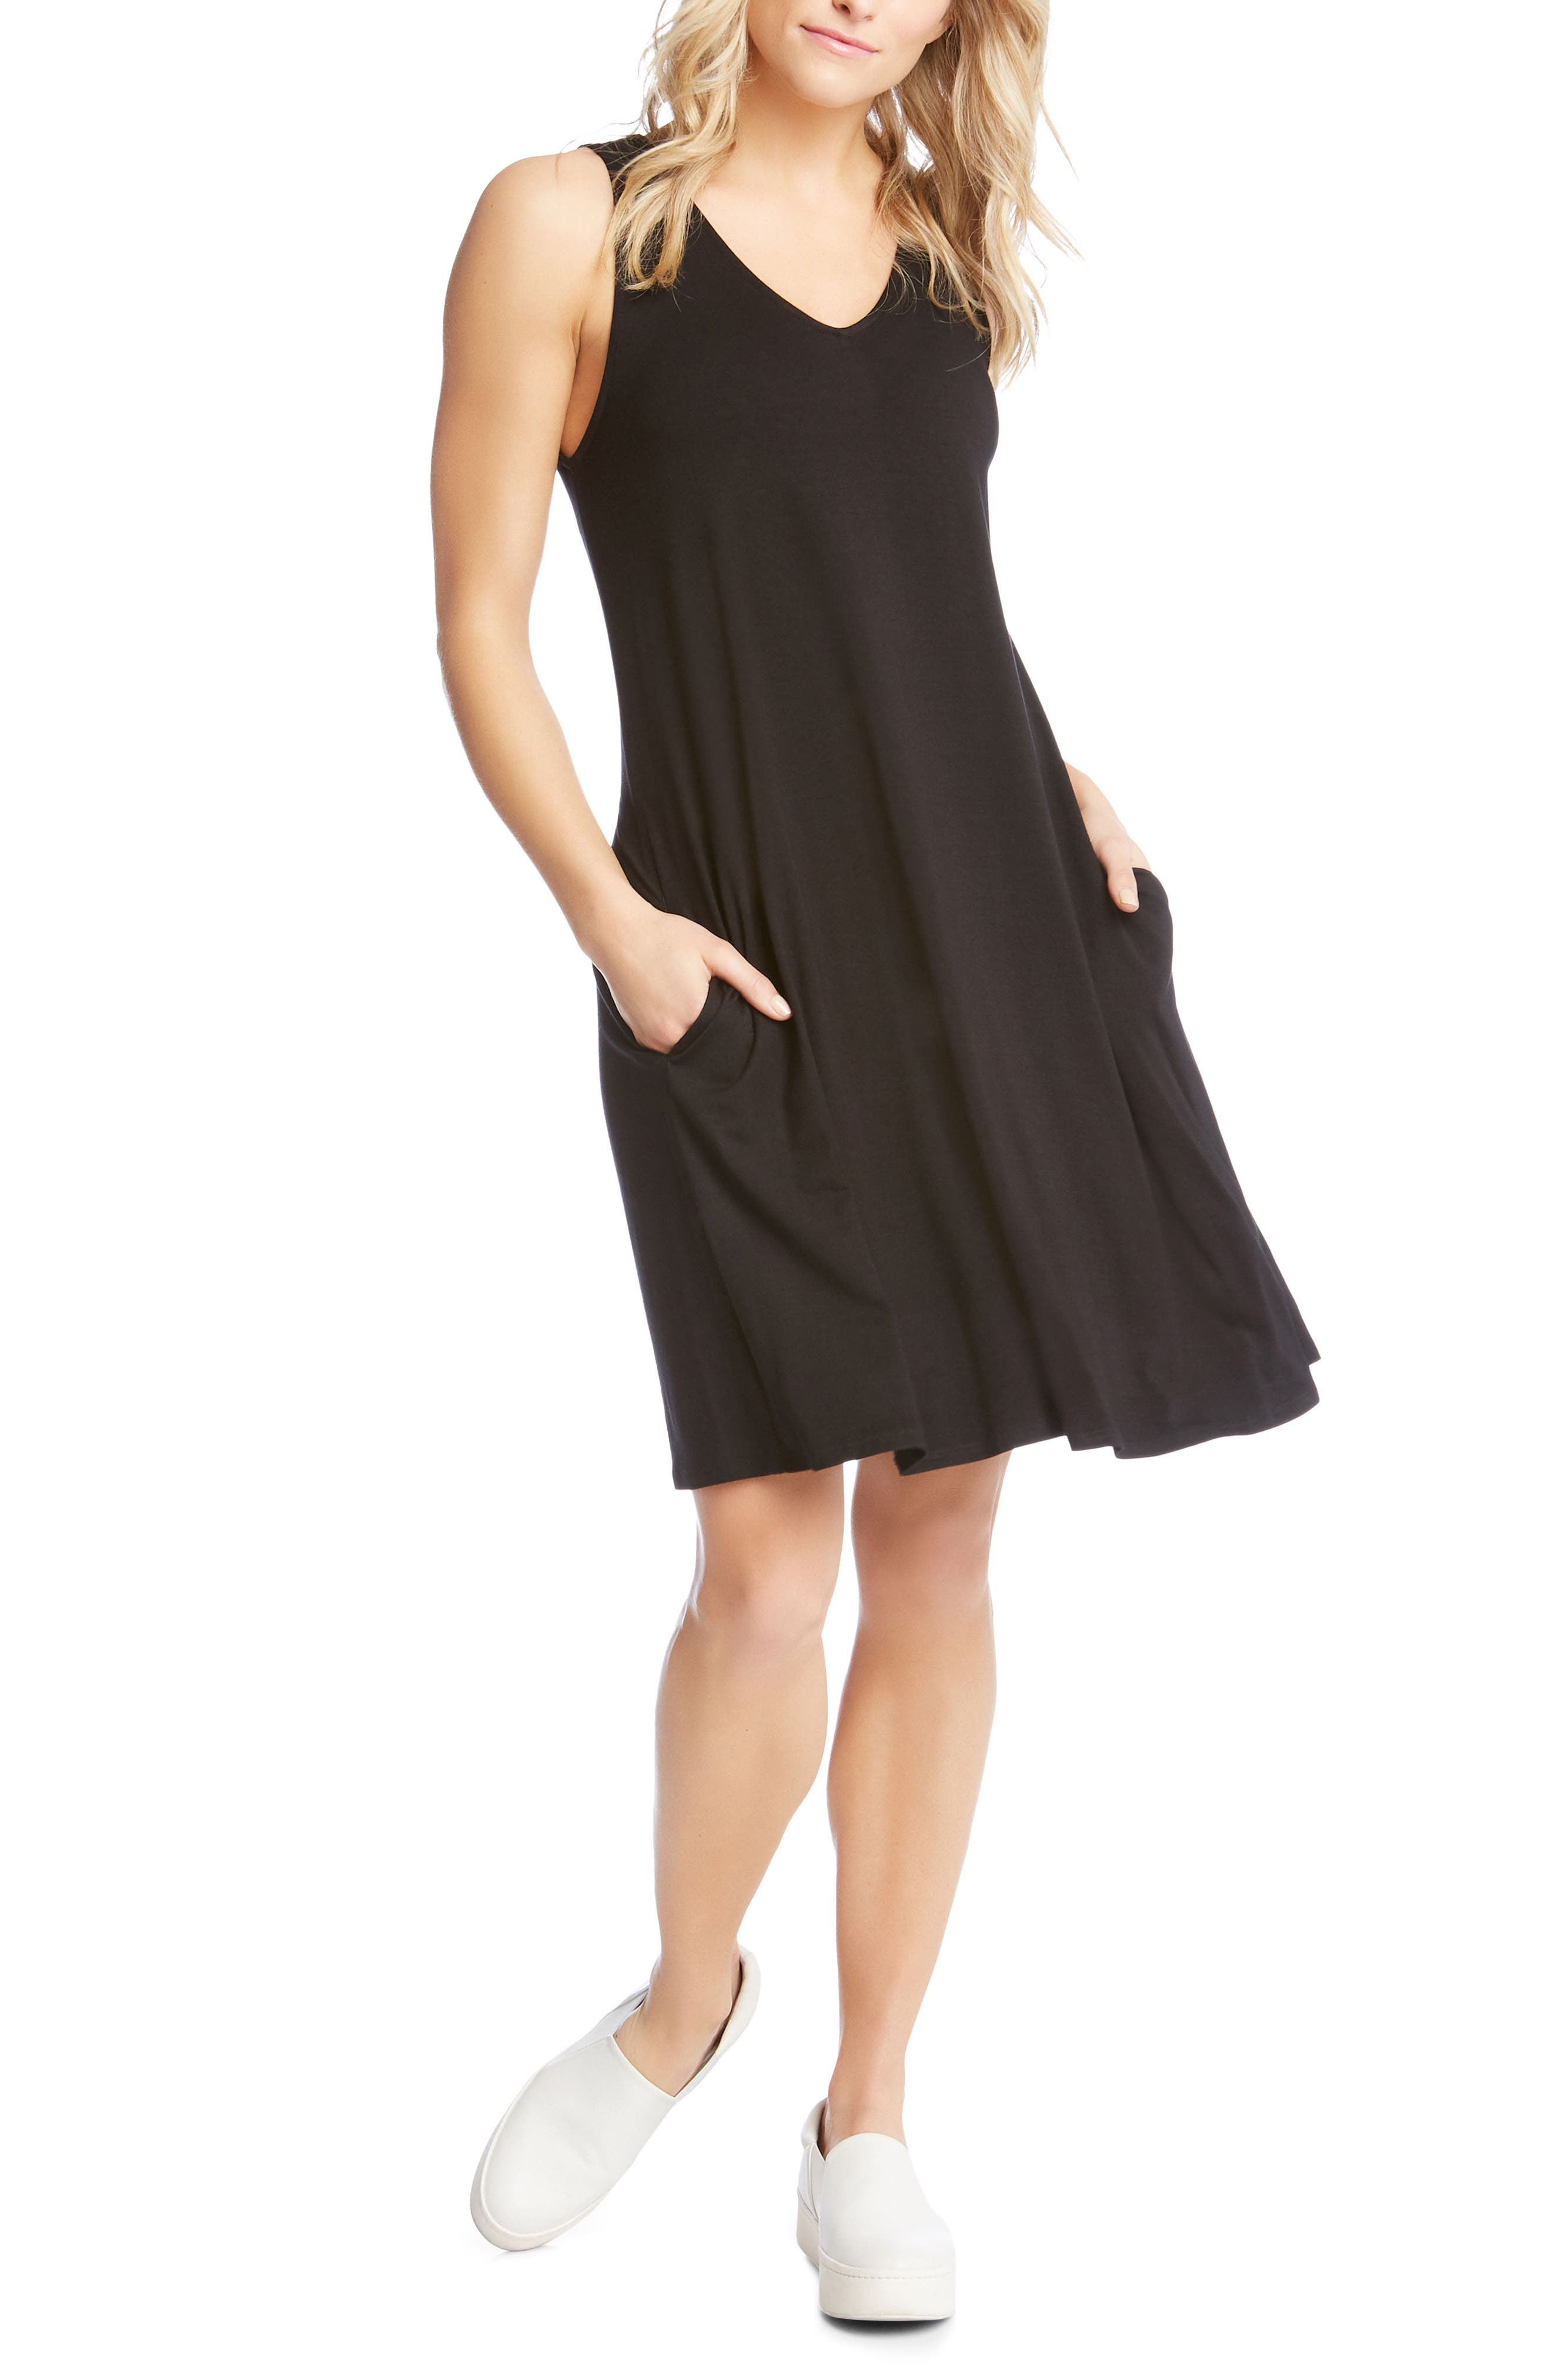 Tessa Jersey Tank Dress,                             Main thumbnail 1, color,                             Black